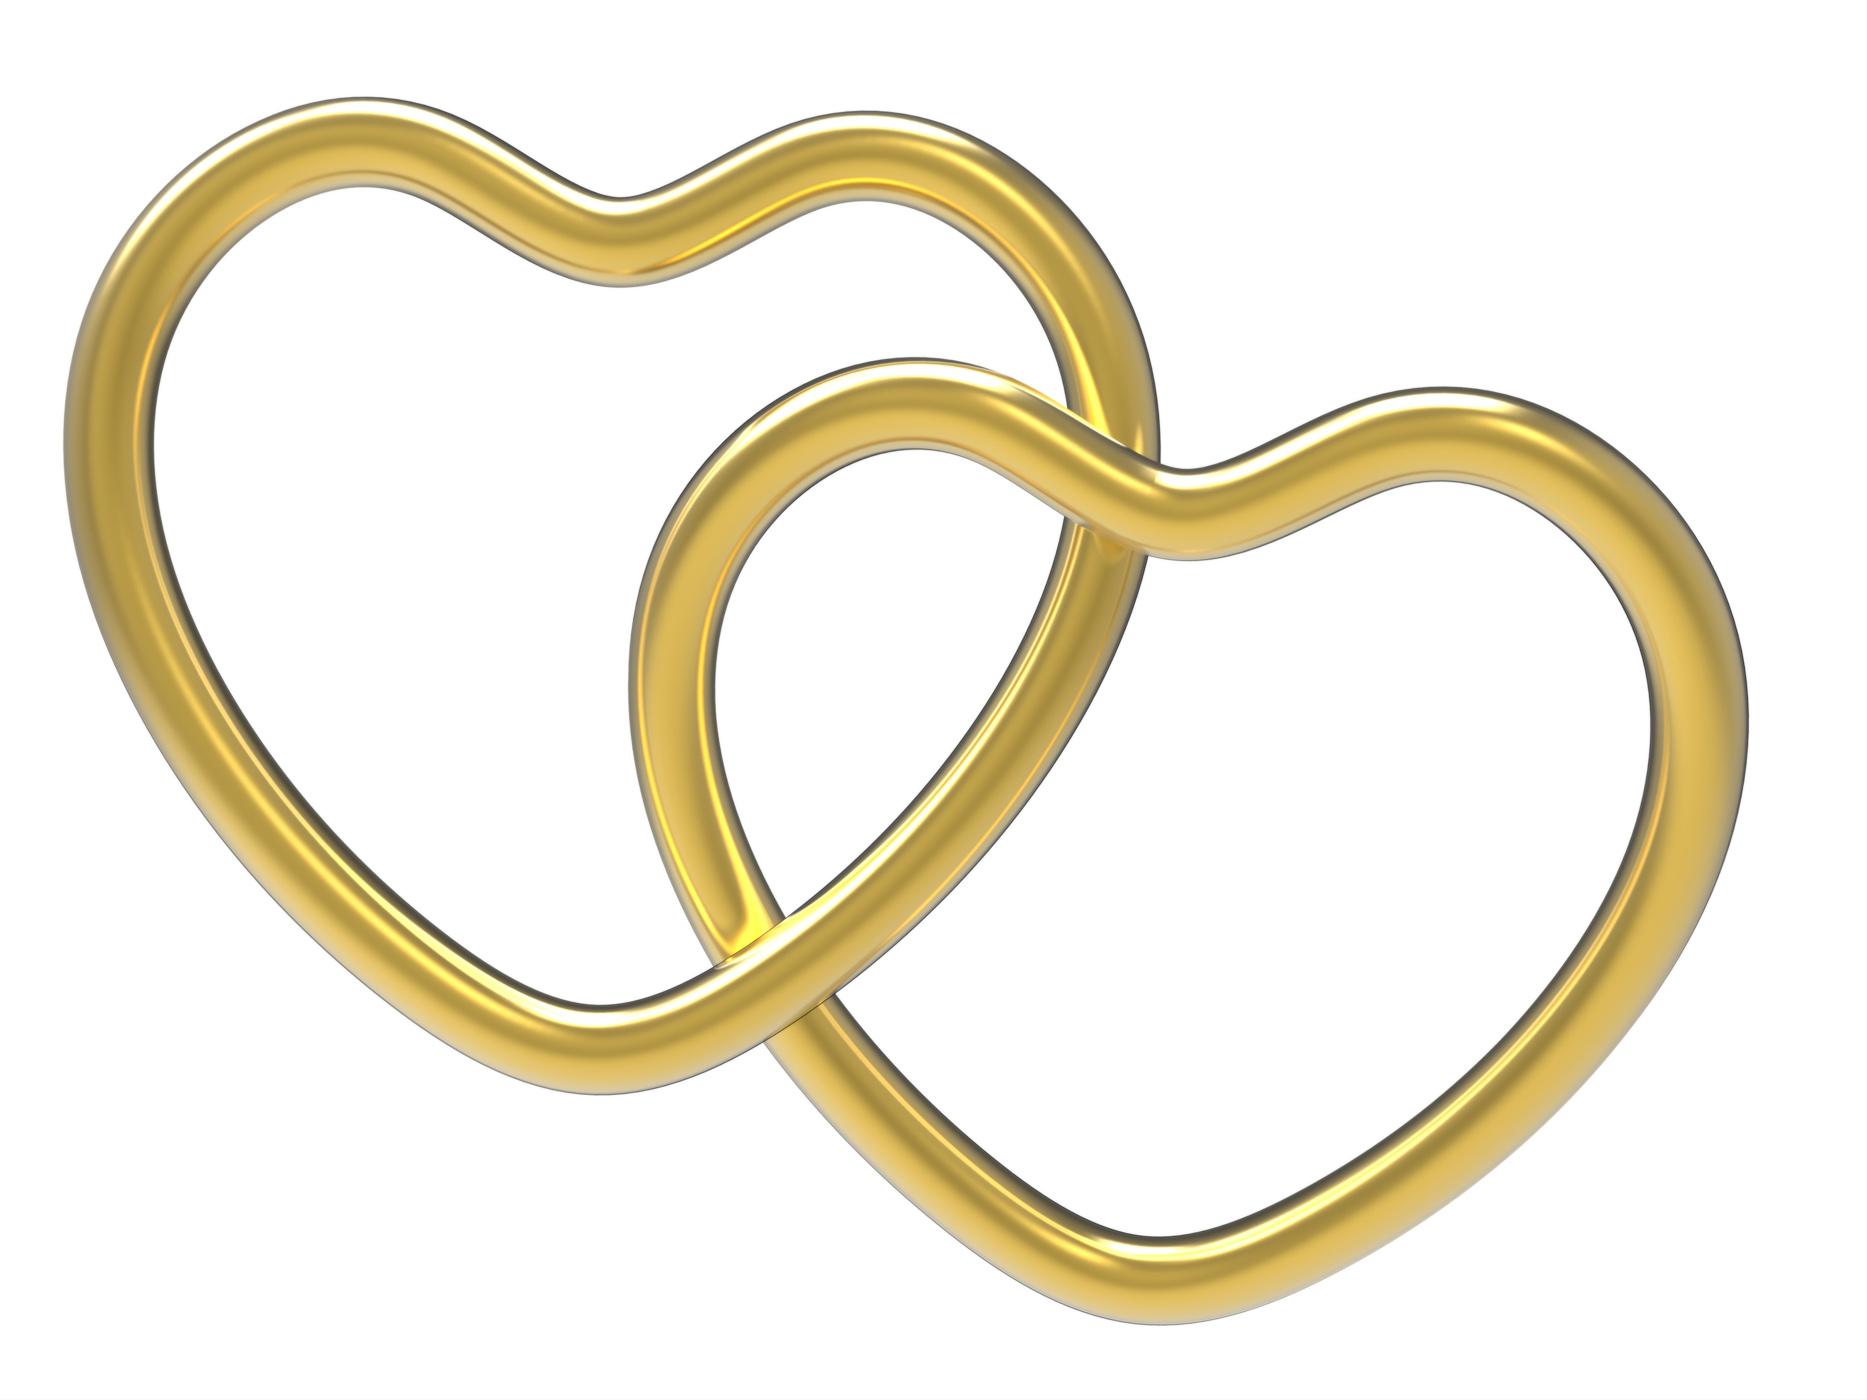 Wedding rings indicates valentine day and eternity photo